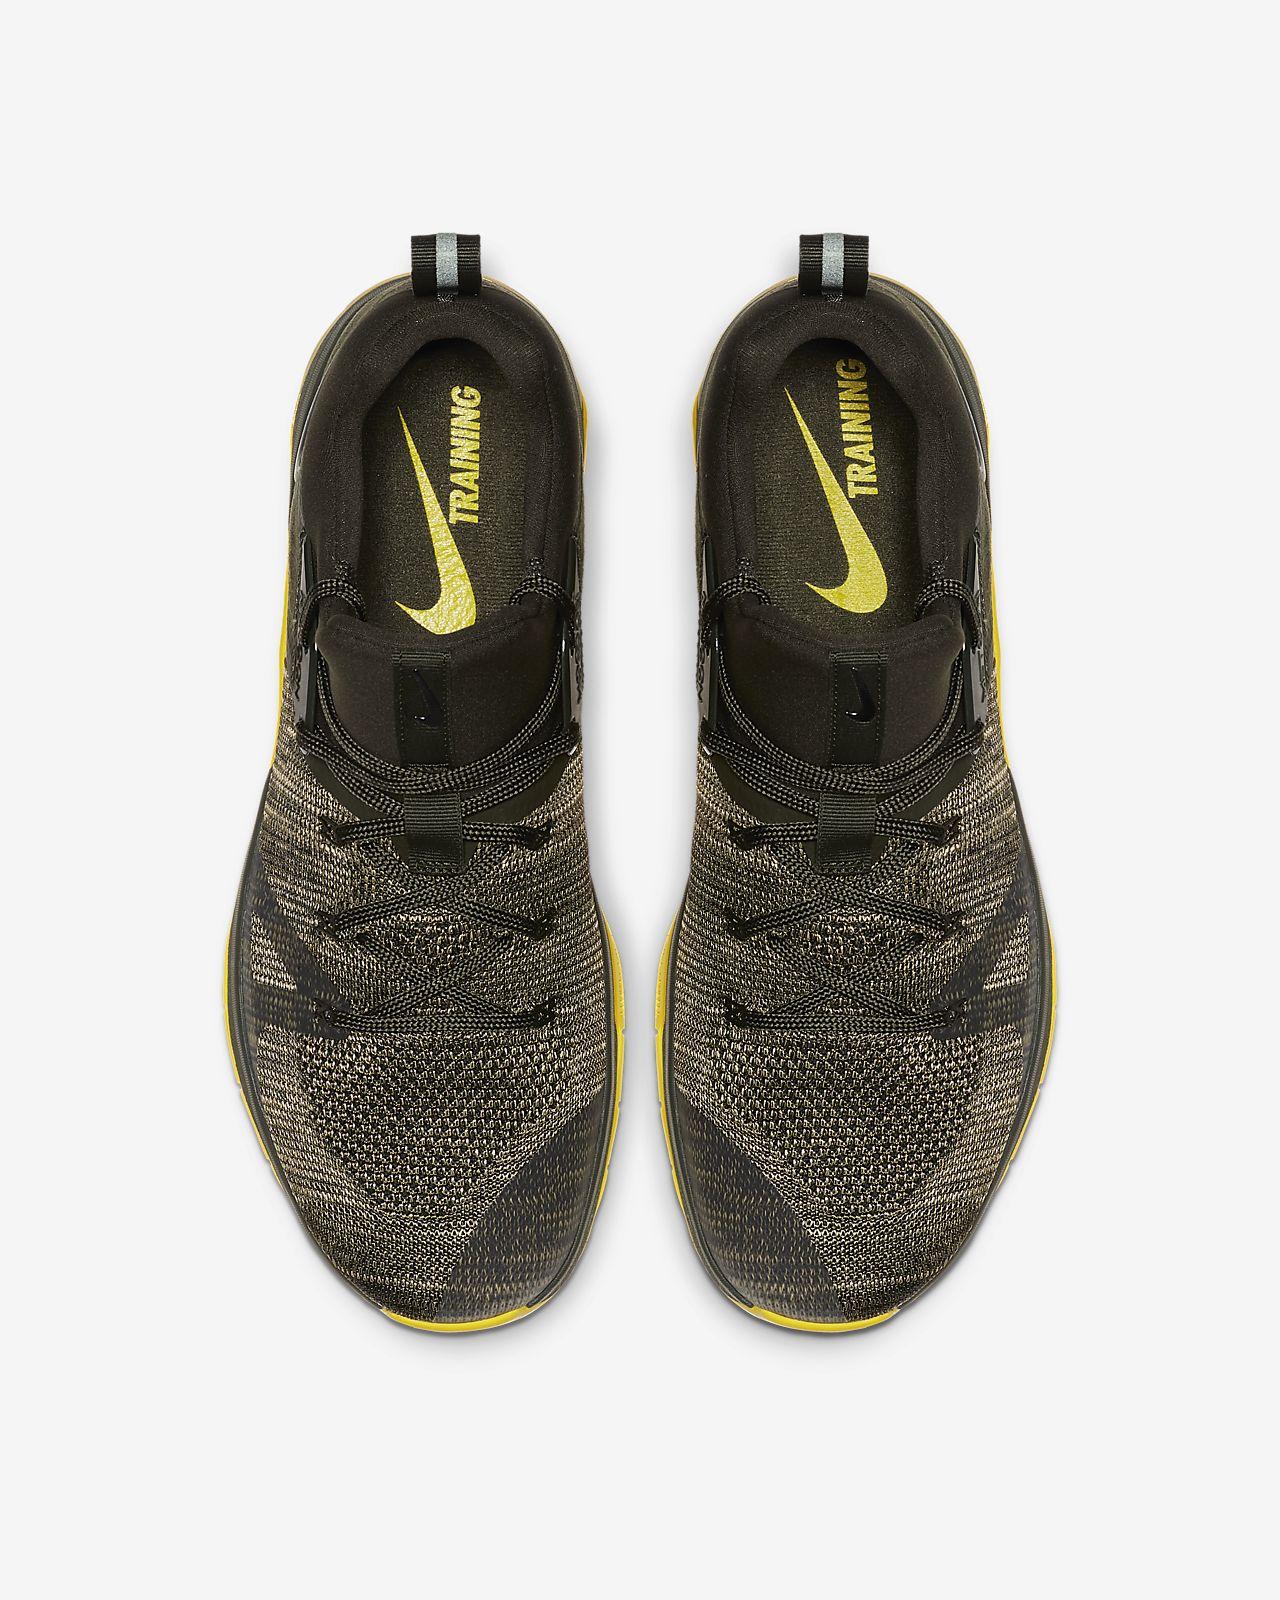 7df2ad94b19c Nike Metcon Flyknit 3 Men s Cross-Training Weightlifting Shoe. Nike ...